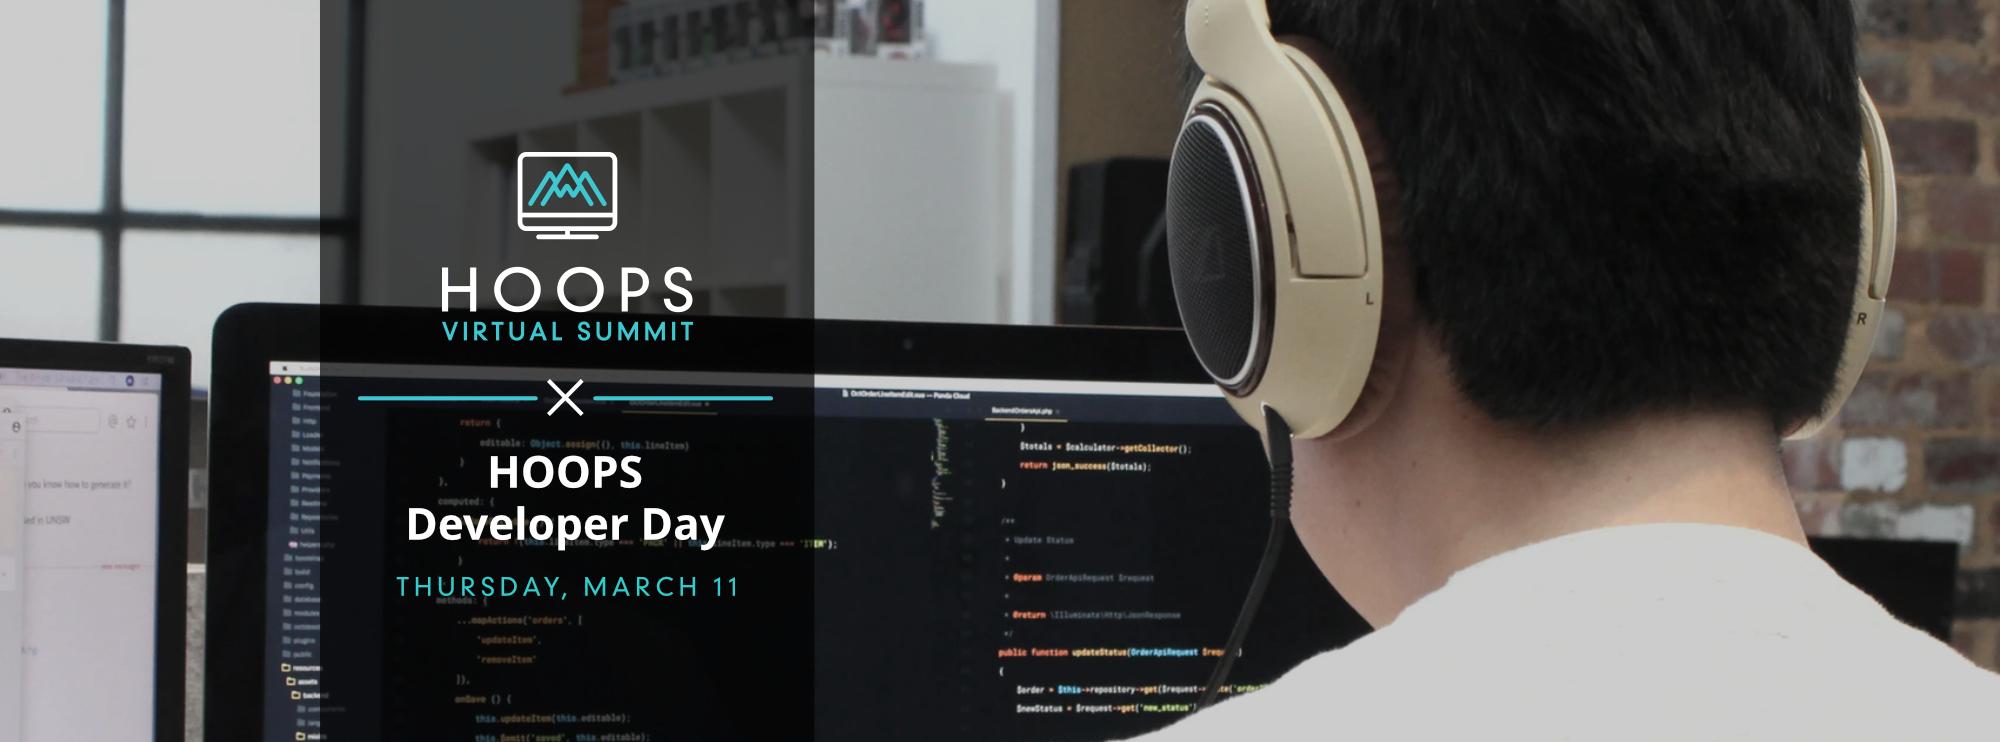 hoops-developer-day